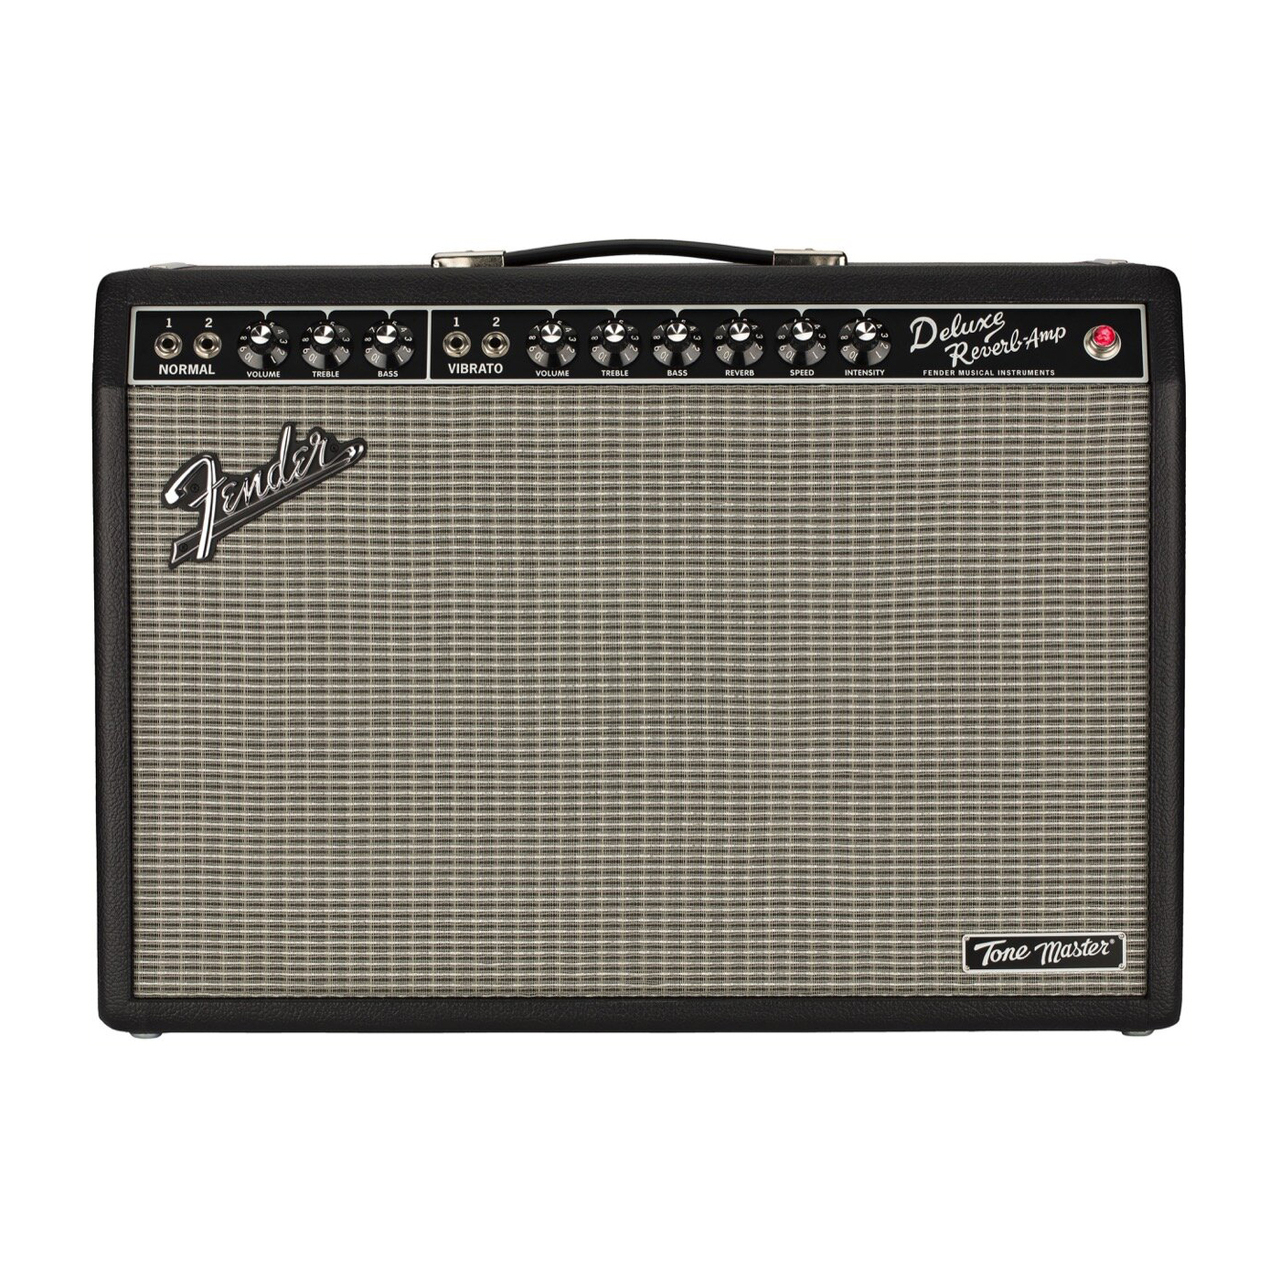 Fender Tone Master Deluxe